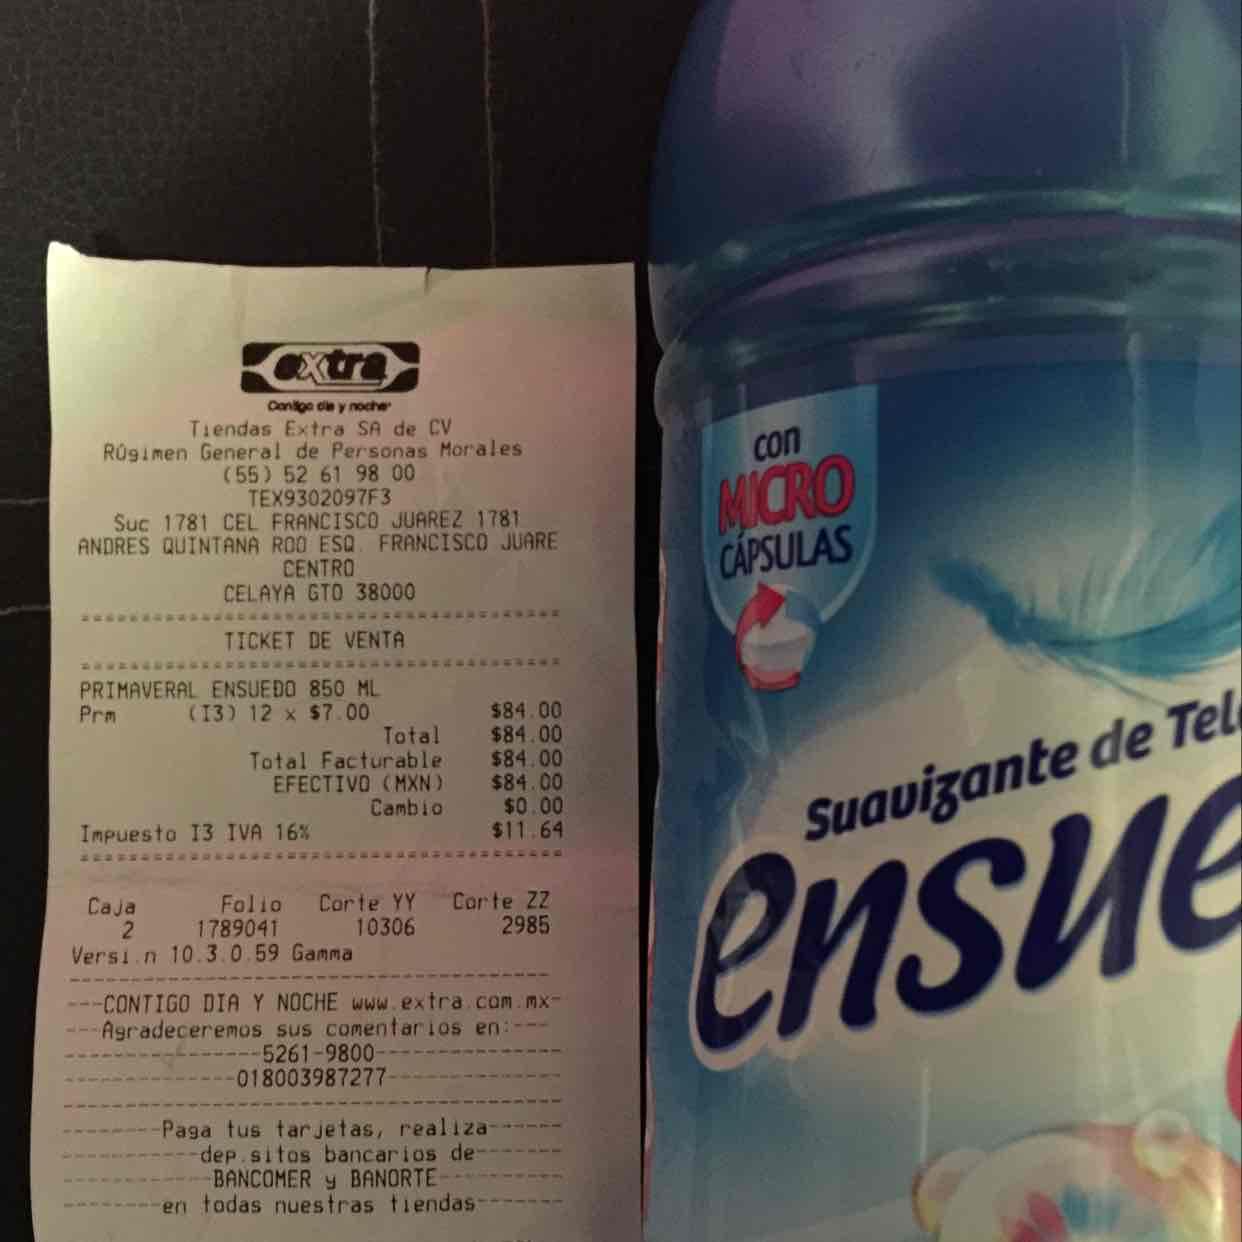 Tiendas Extra: Suavizante de telas Ensueño 850 ml 2x$14